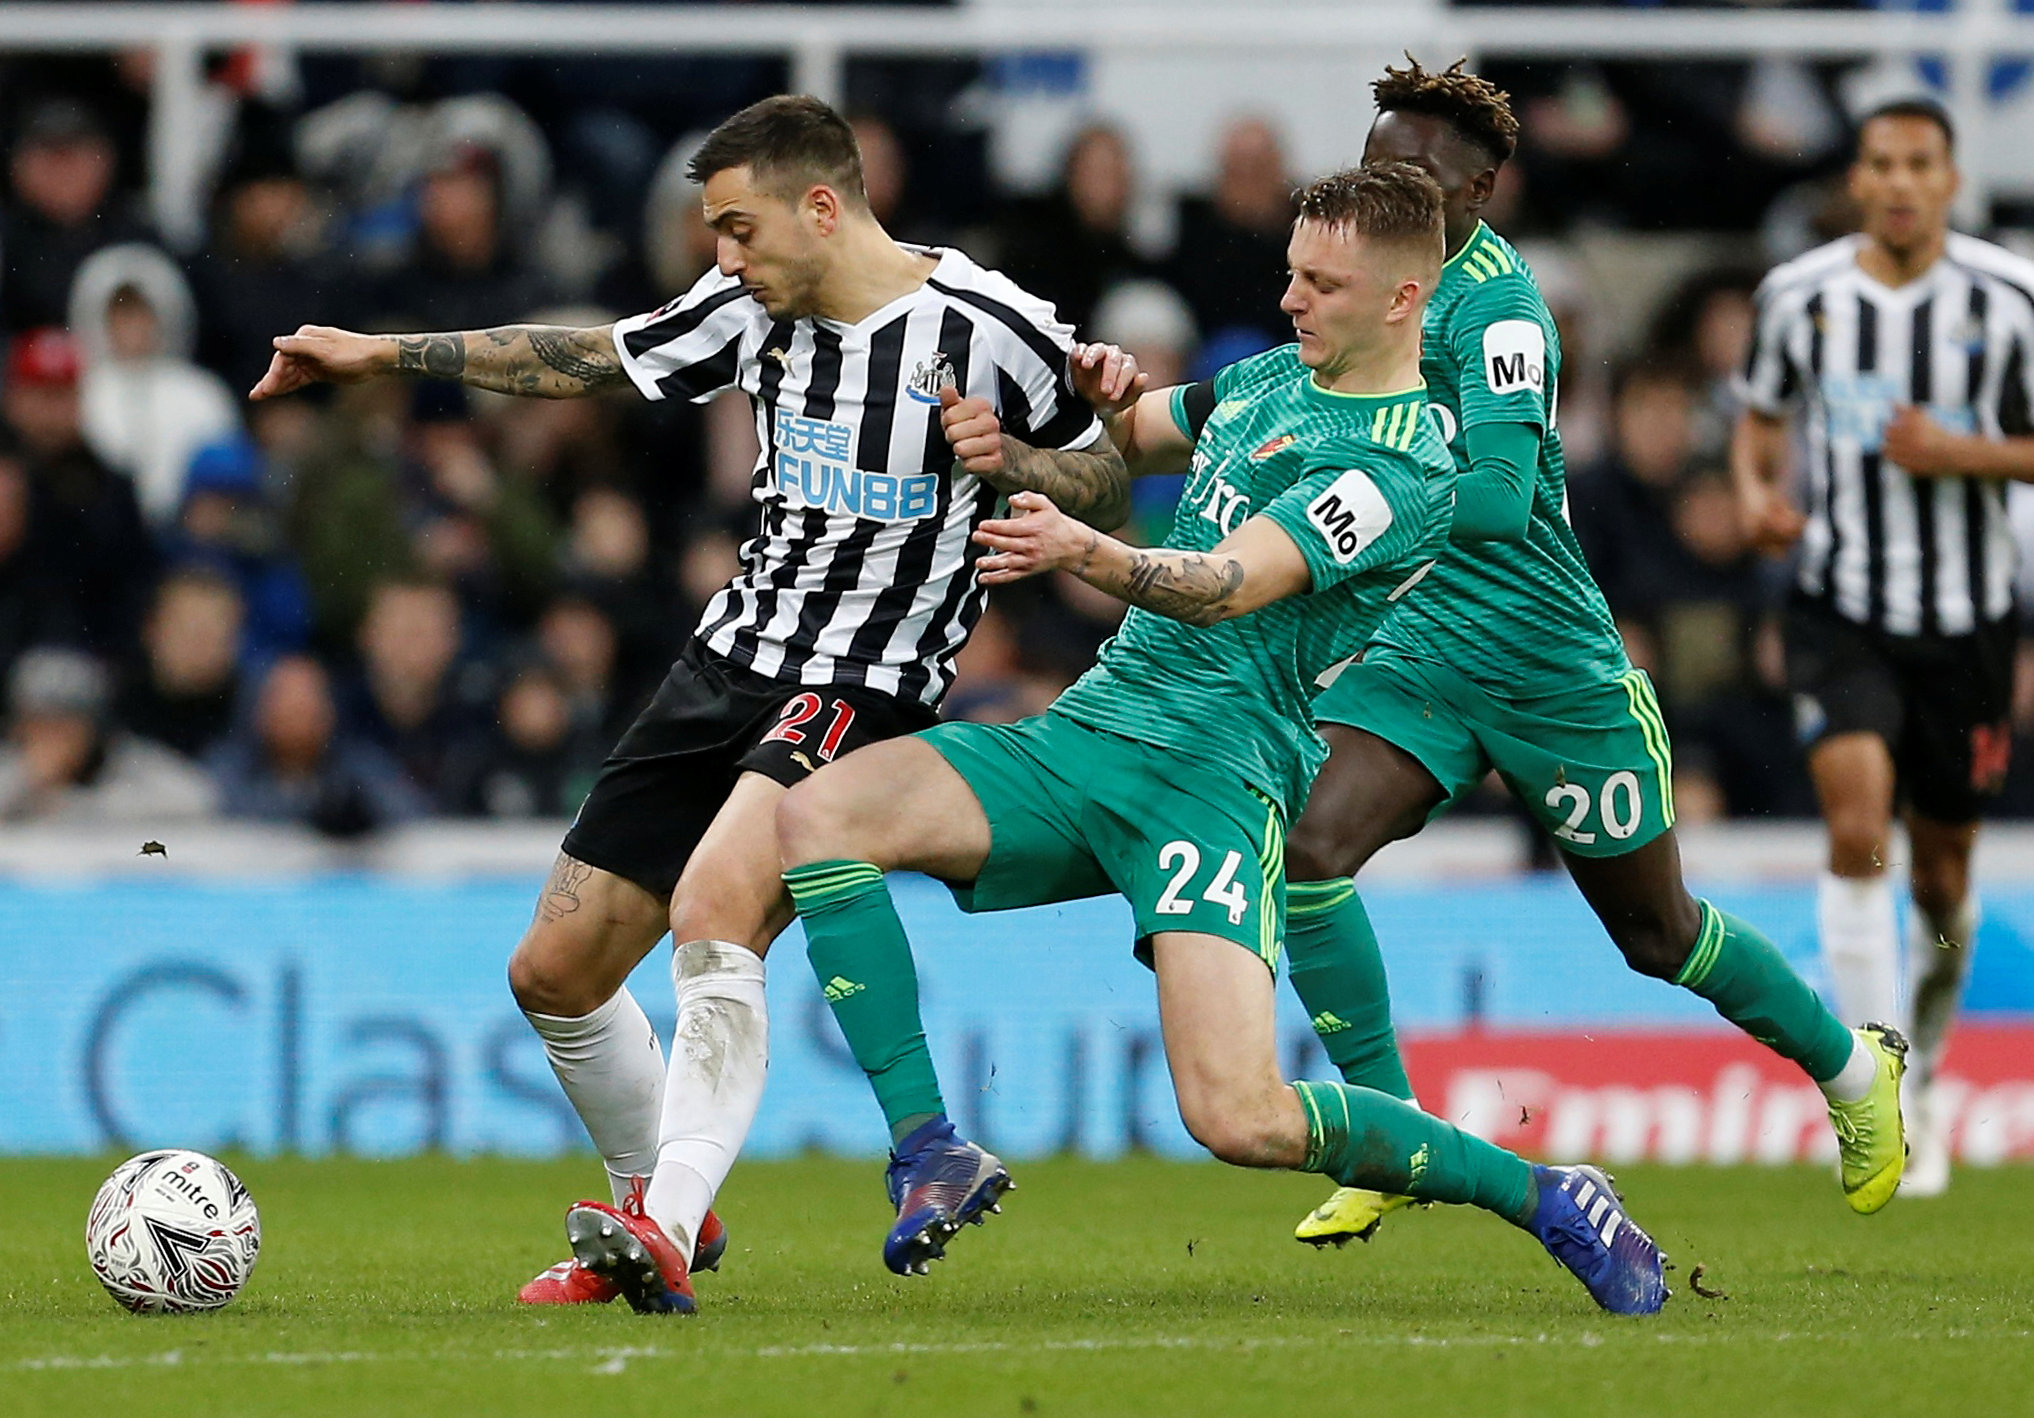 Watford's Swansea City loanee Ben Wilmot makes England Under-21 debut in Slovenia draw